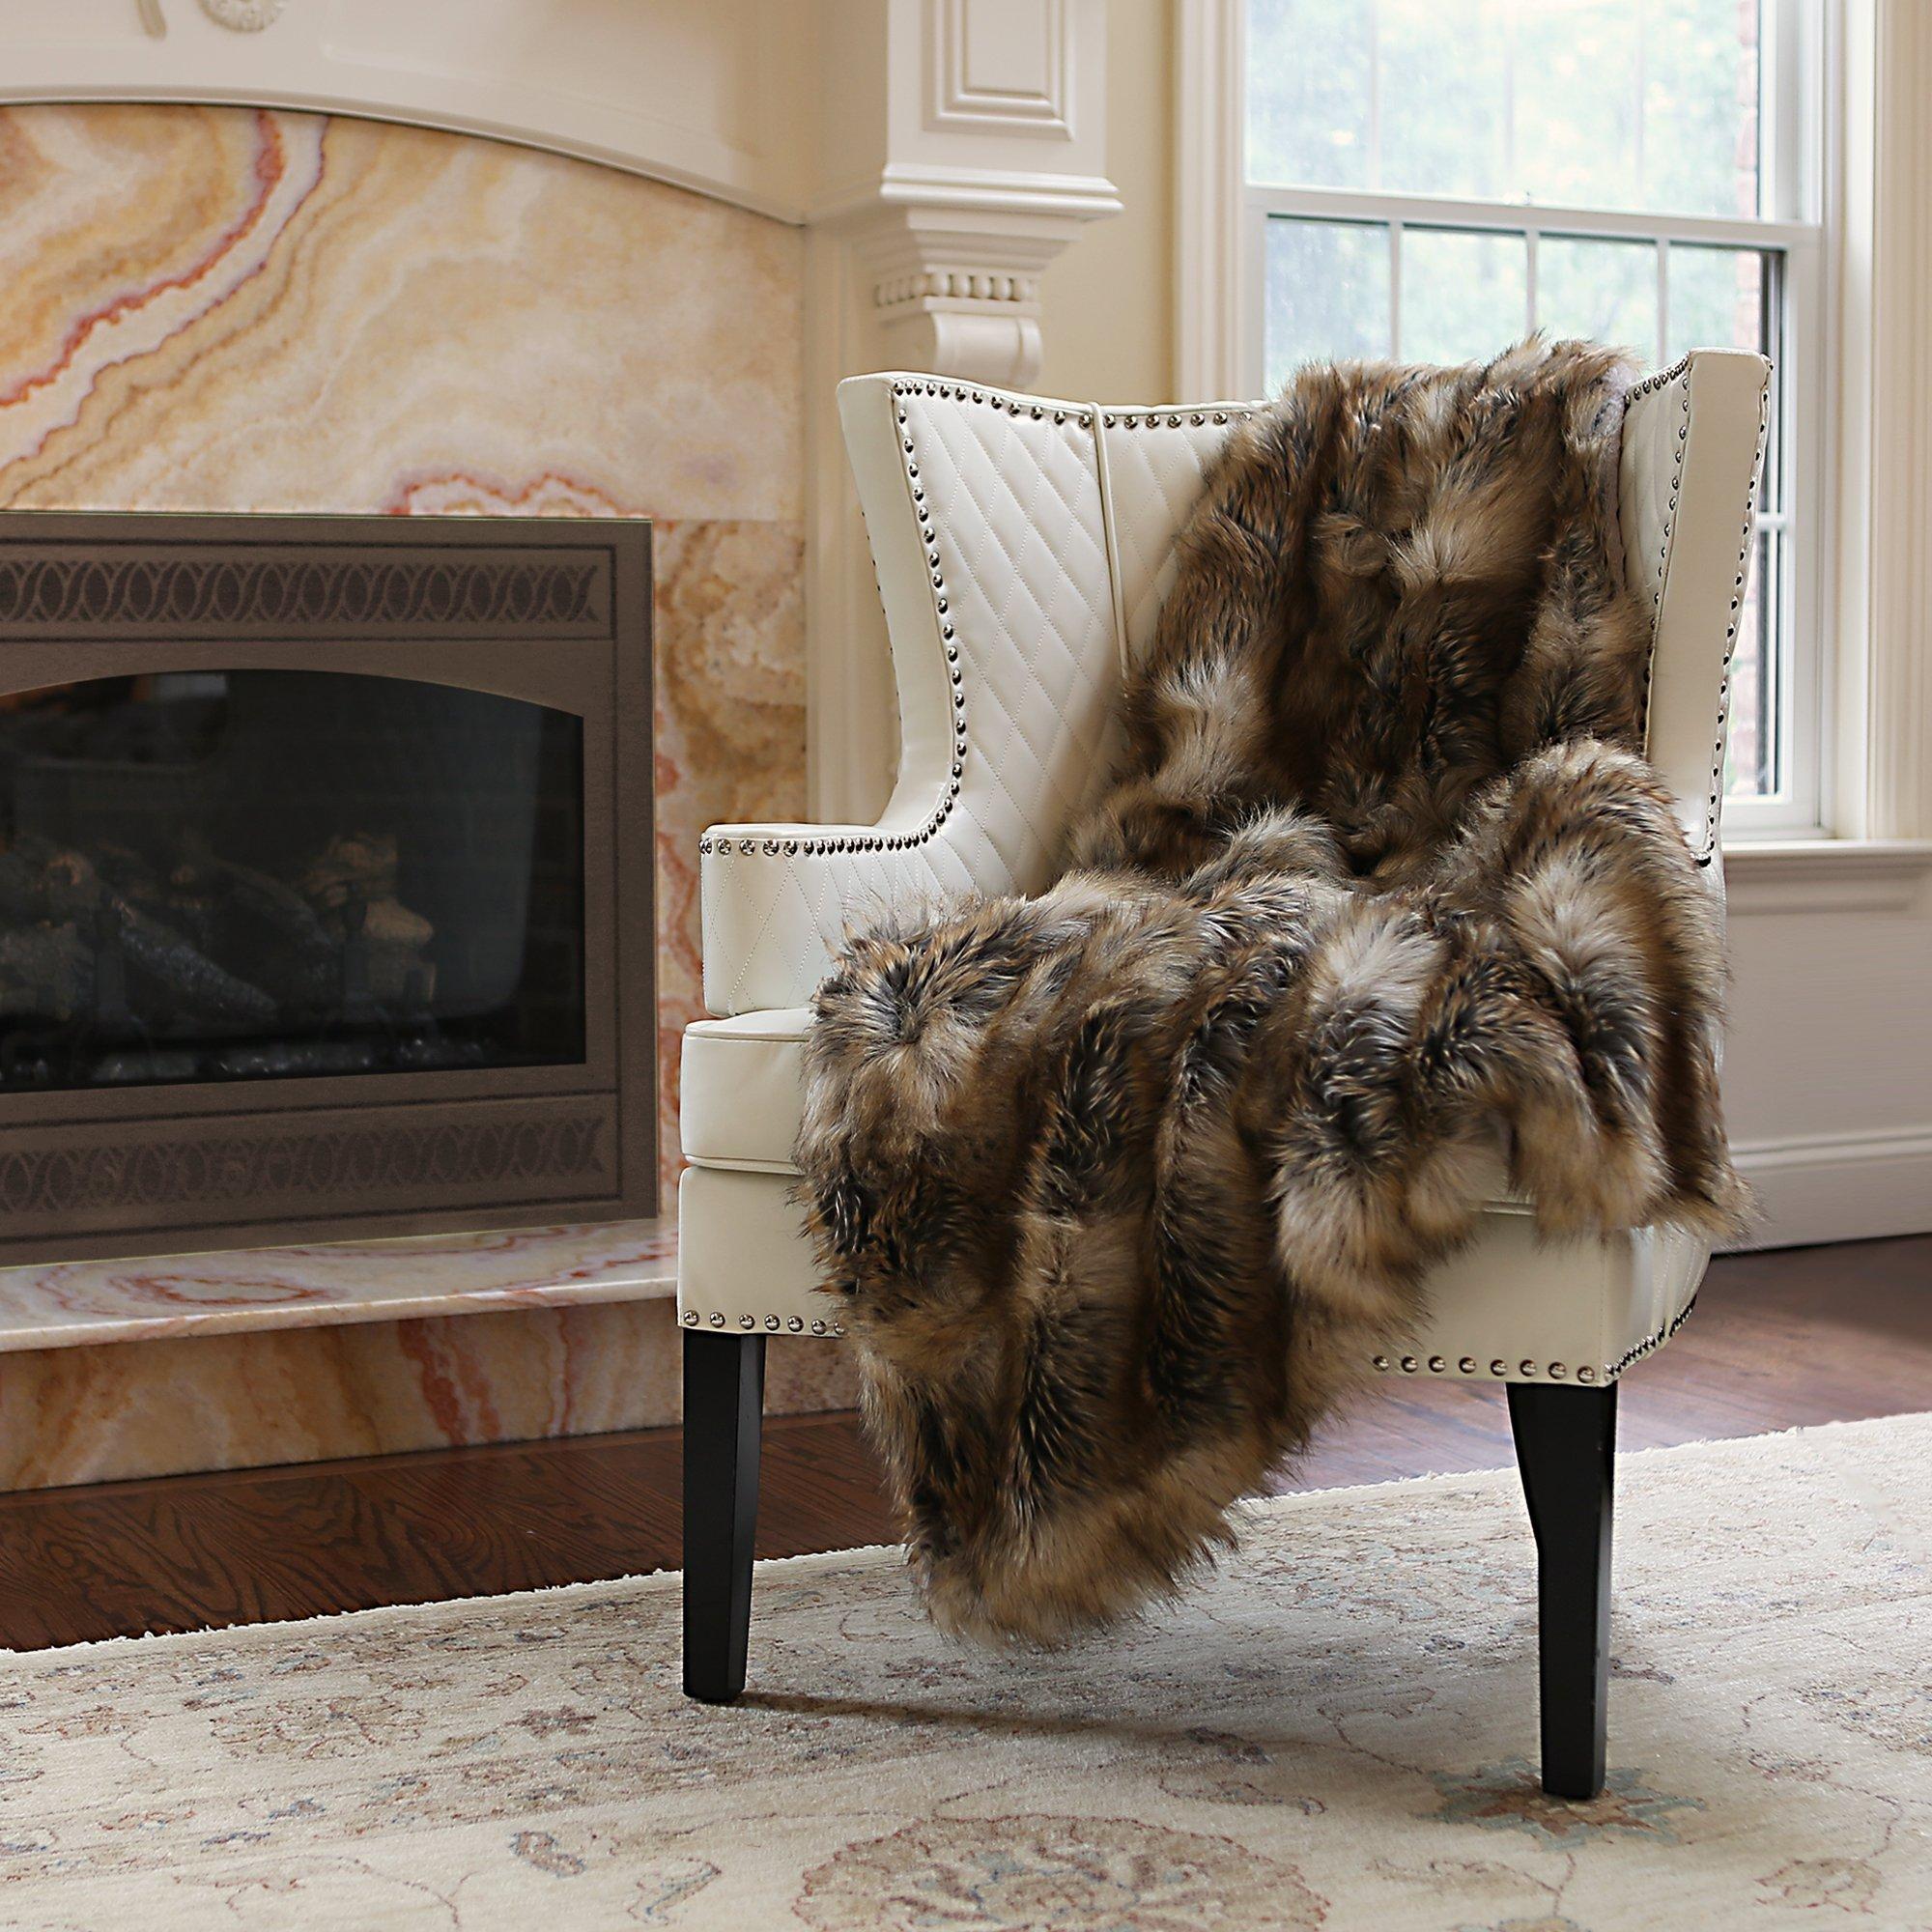 Best Home Fashion Faux Fur Throw - Lap Blanket - Amber Fox - 58''W x 36''L - (1 Throw)